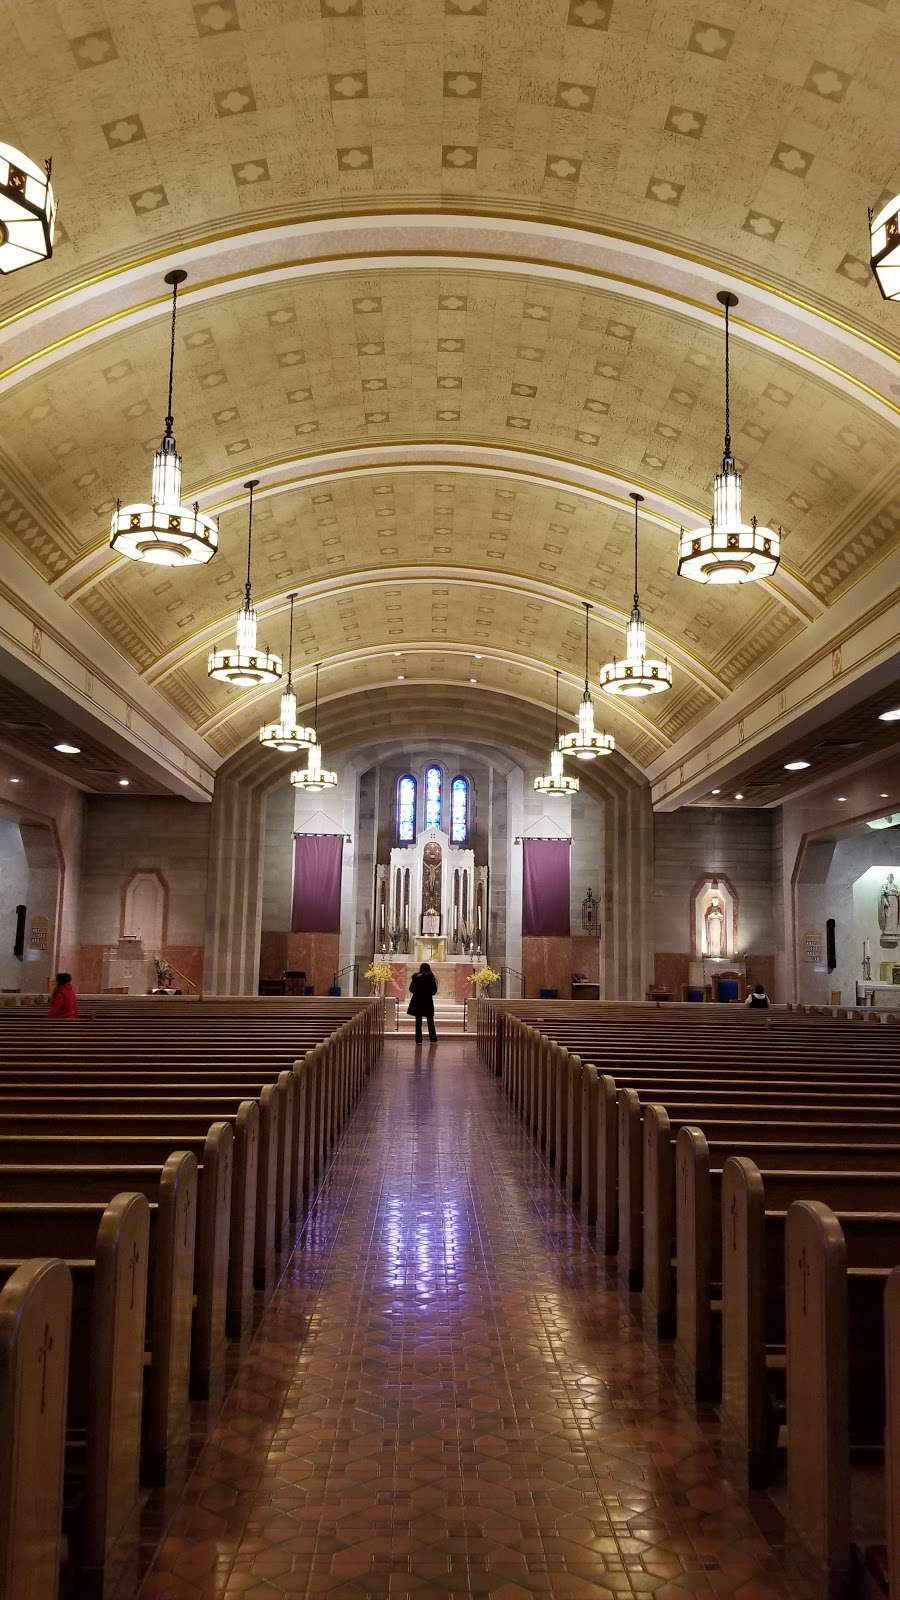 St Josephs Church - church    Photo 10 of 10   Address: 500 Woodlawn Ave, Collingdale, PA 19023, USA   Phone: (610) 583-4530